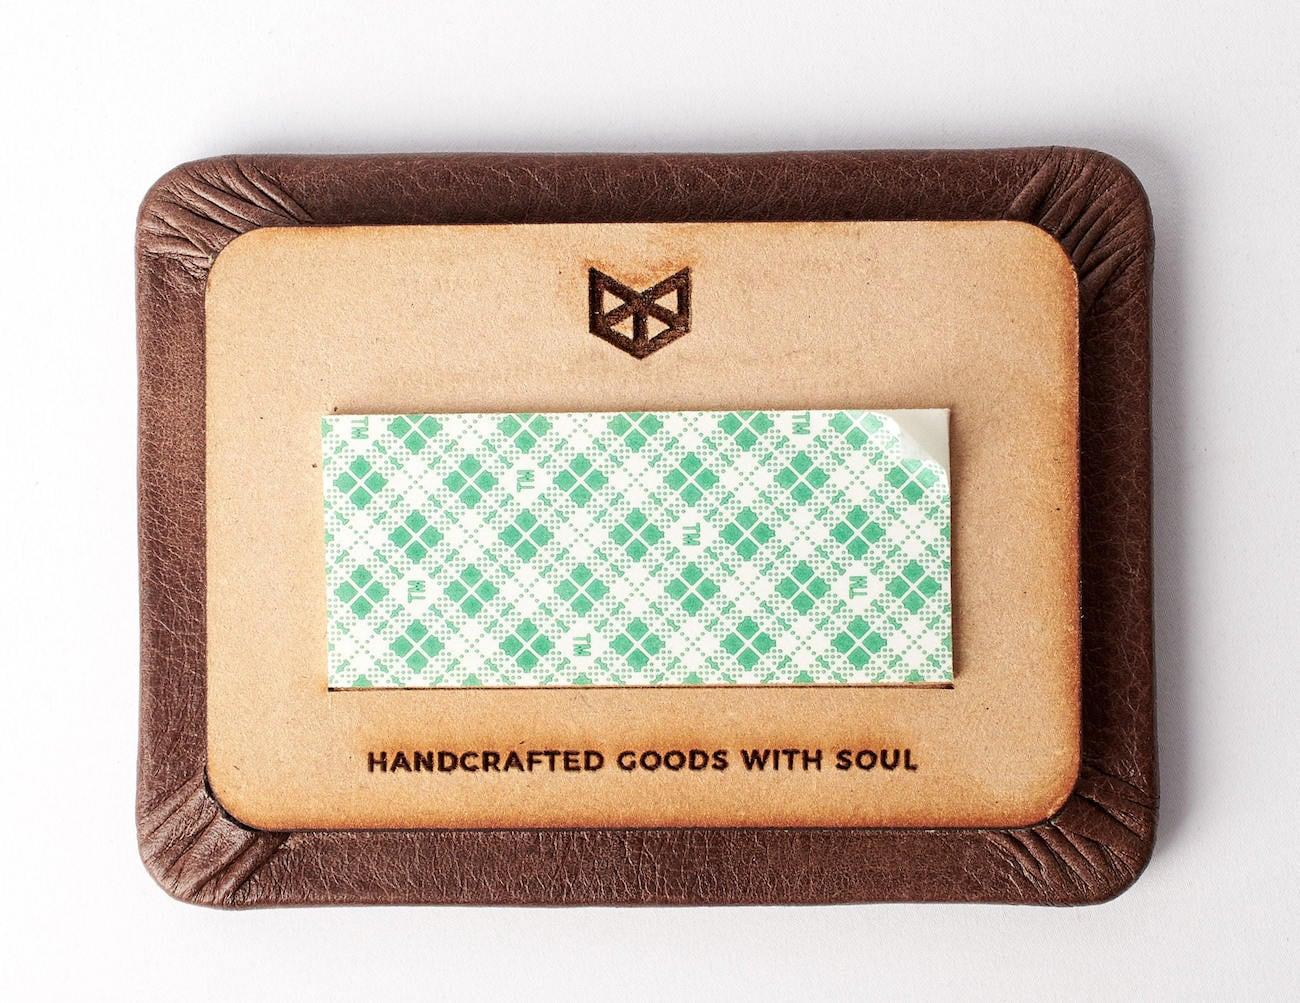 Capra Magnetic Leather Key Holder